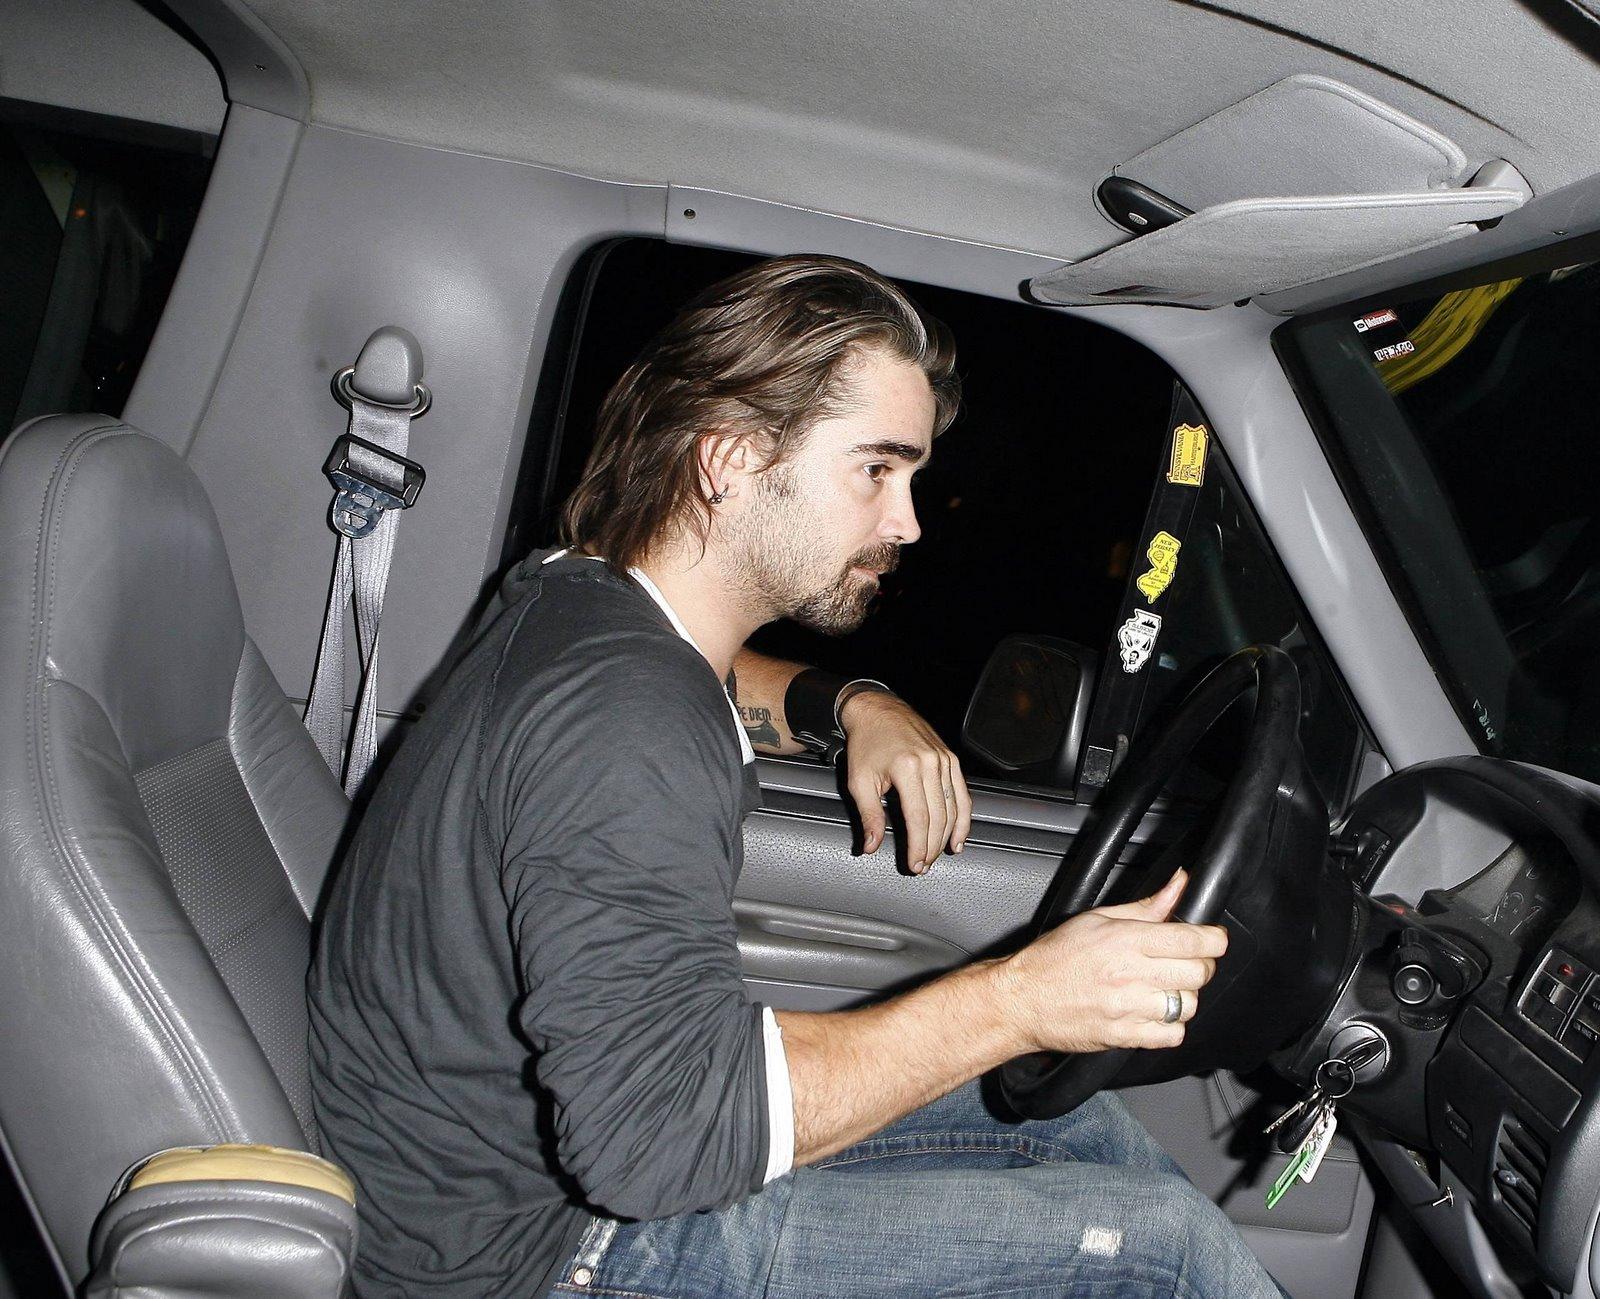 http://2.bp.blogspot.com/_HUPRWVprrhc/R1Bq3OGv1tI/AAAAAAAAAec/EYXJN_4h94Q/s1600-R/celebutopia_Colin+Farrell+driving+in+Los+Angeles_281107_01.jpg